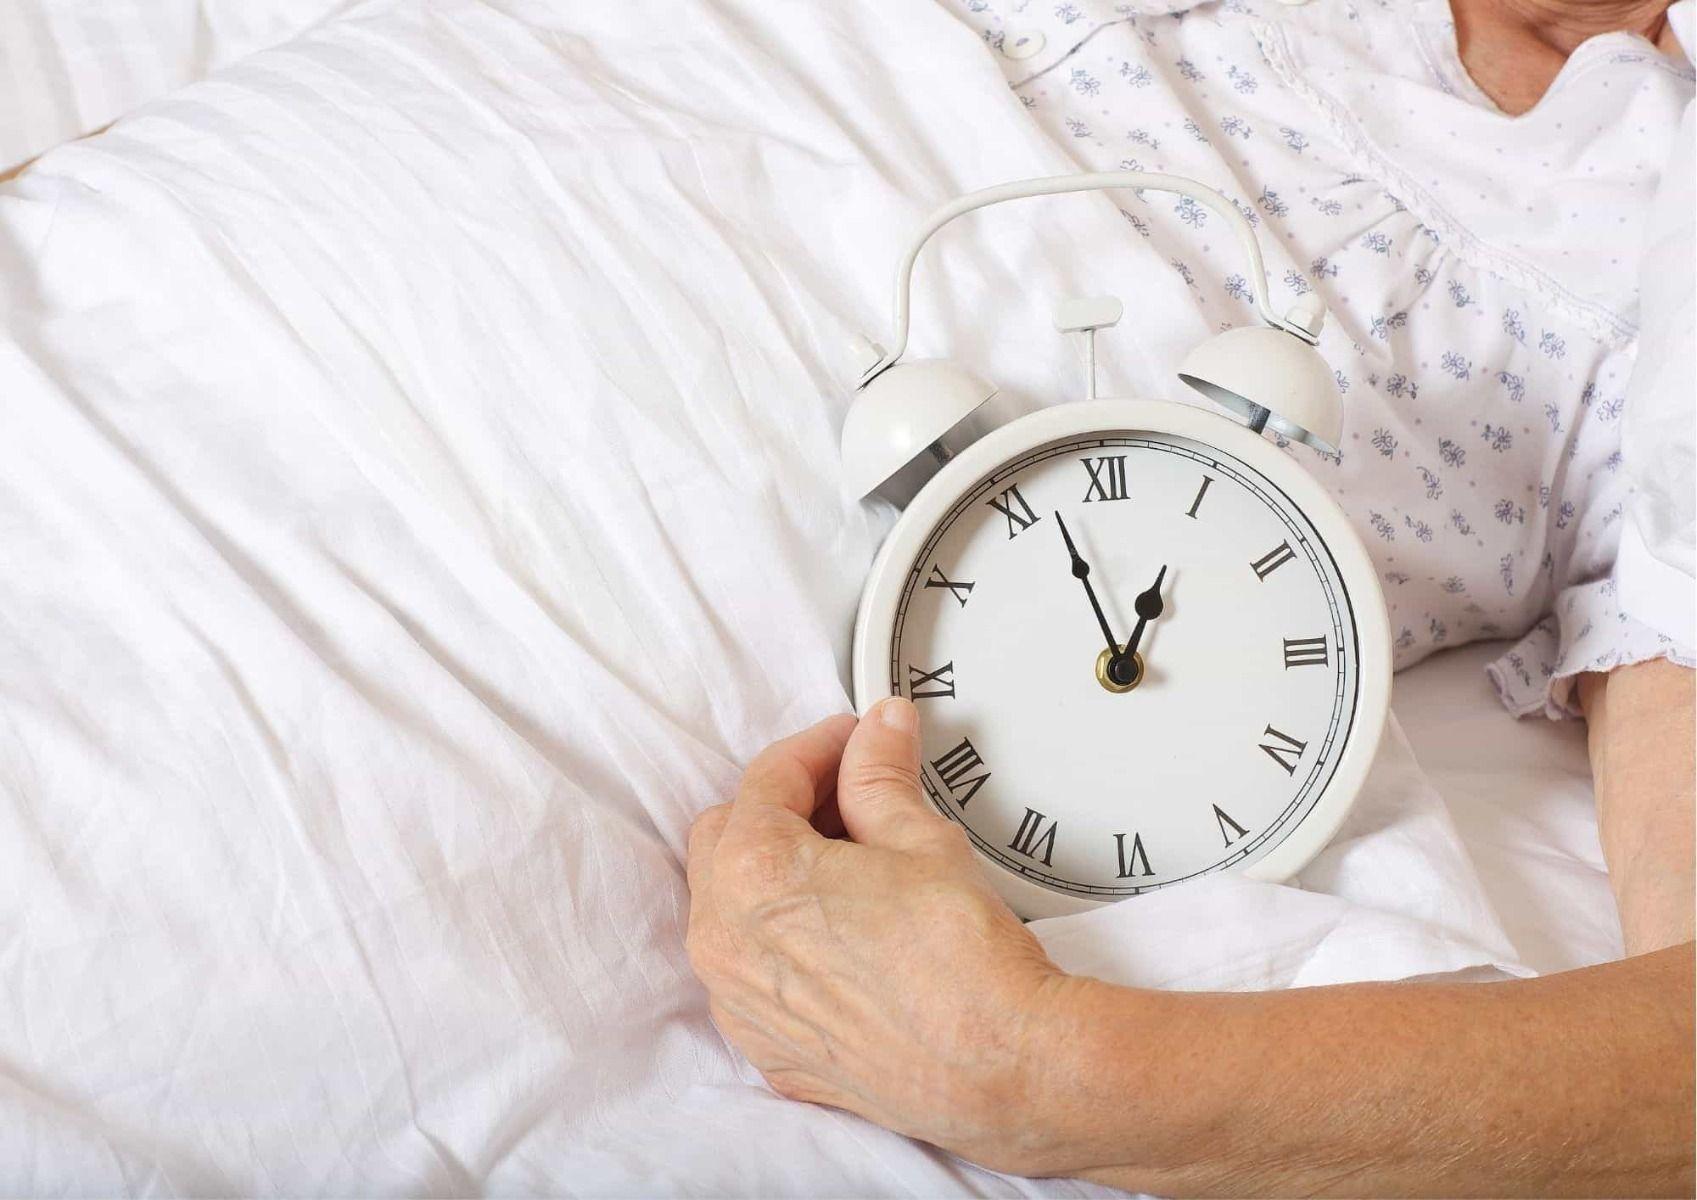 dementia clock helps seniors keep track of time